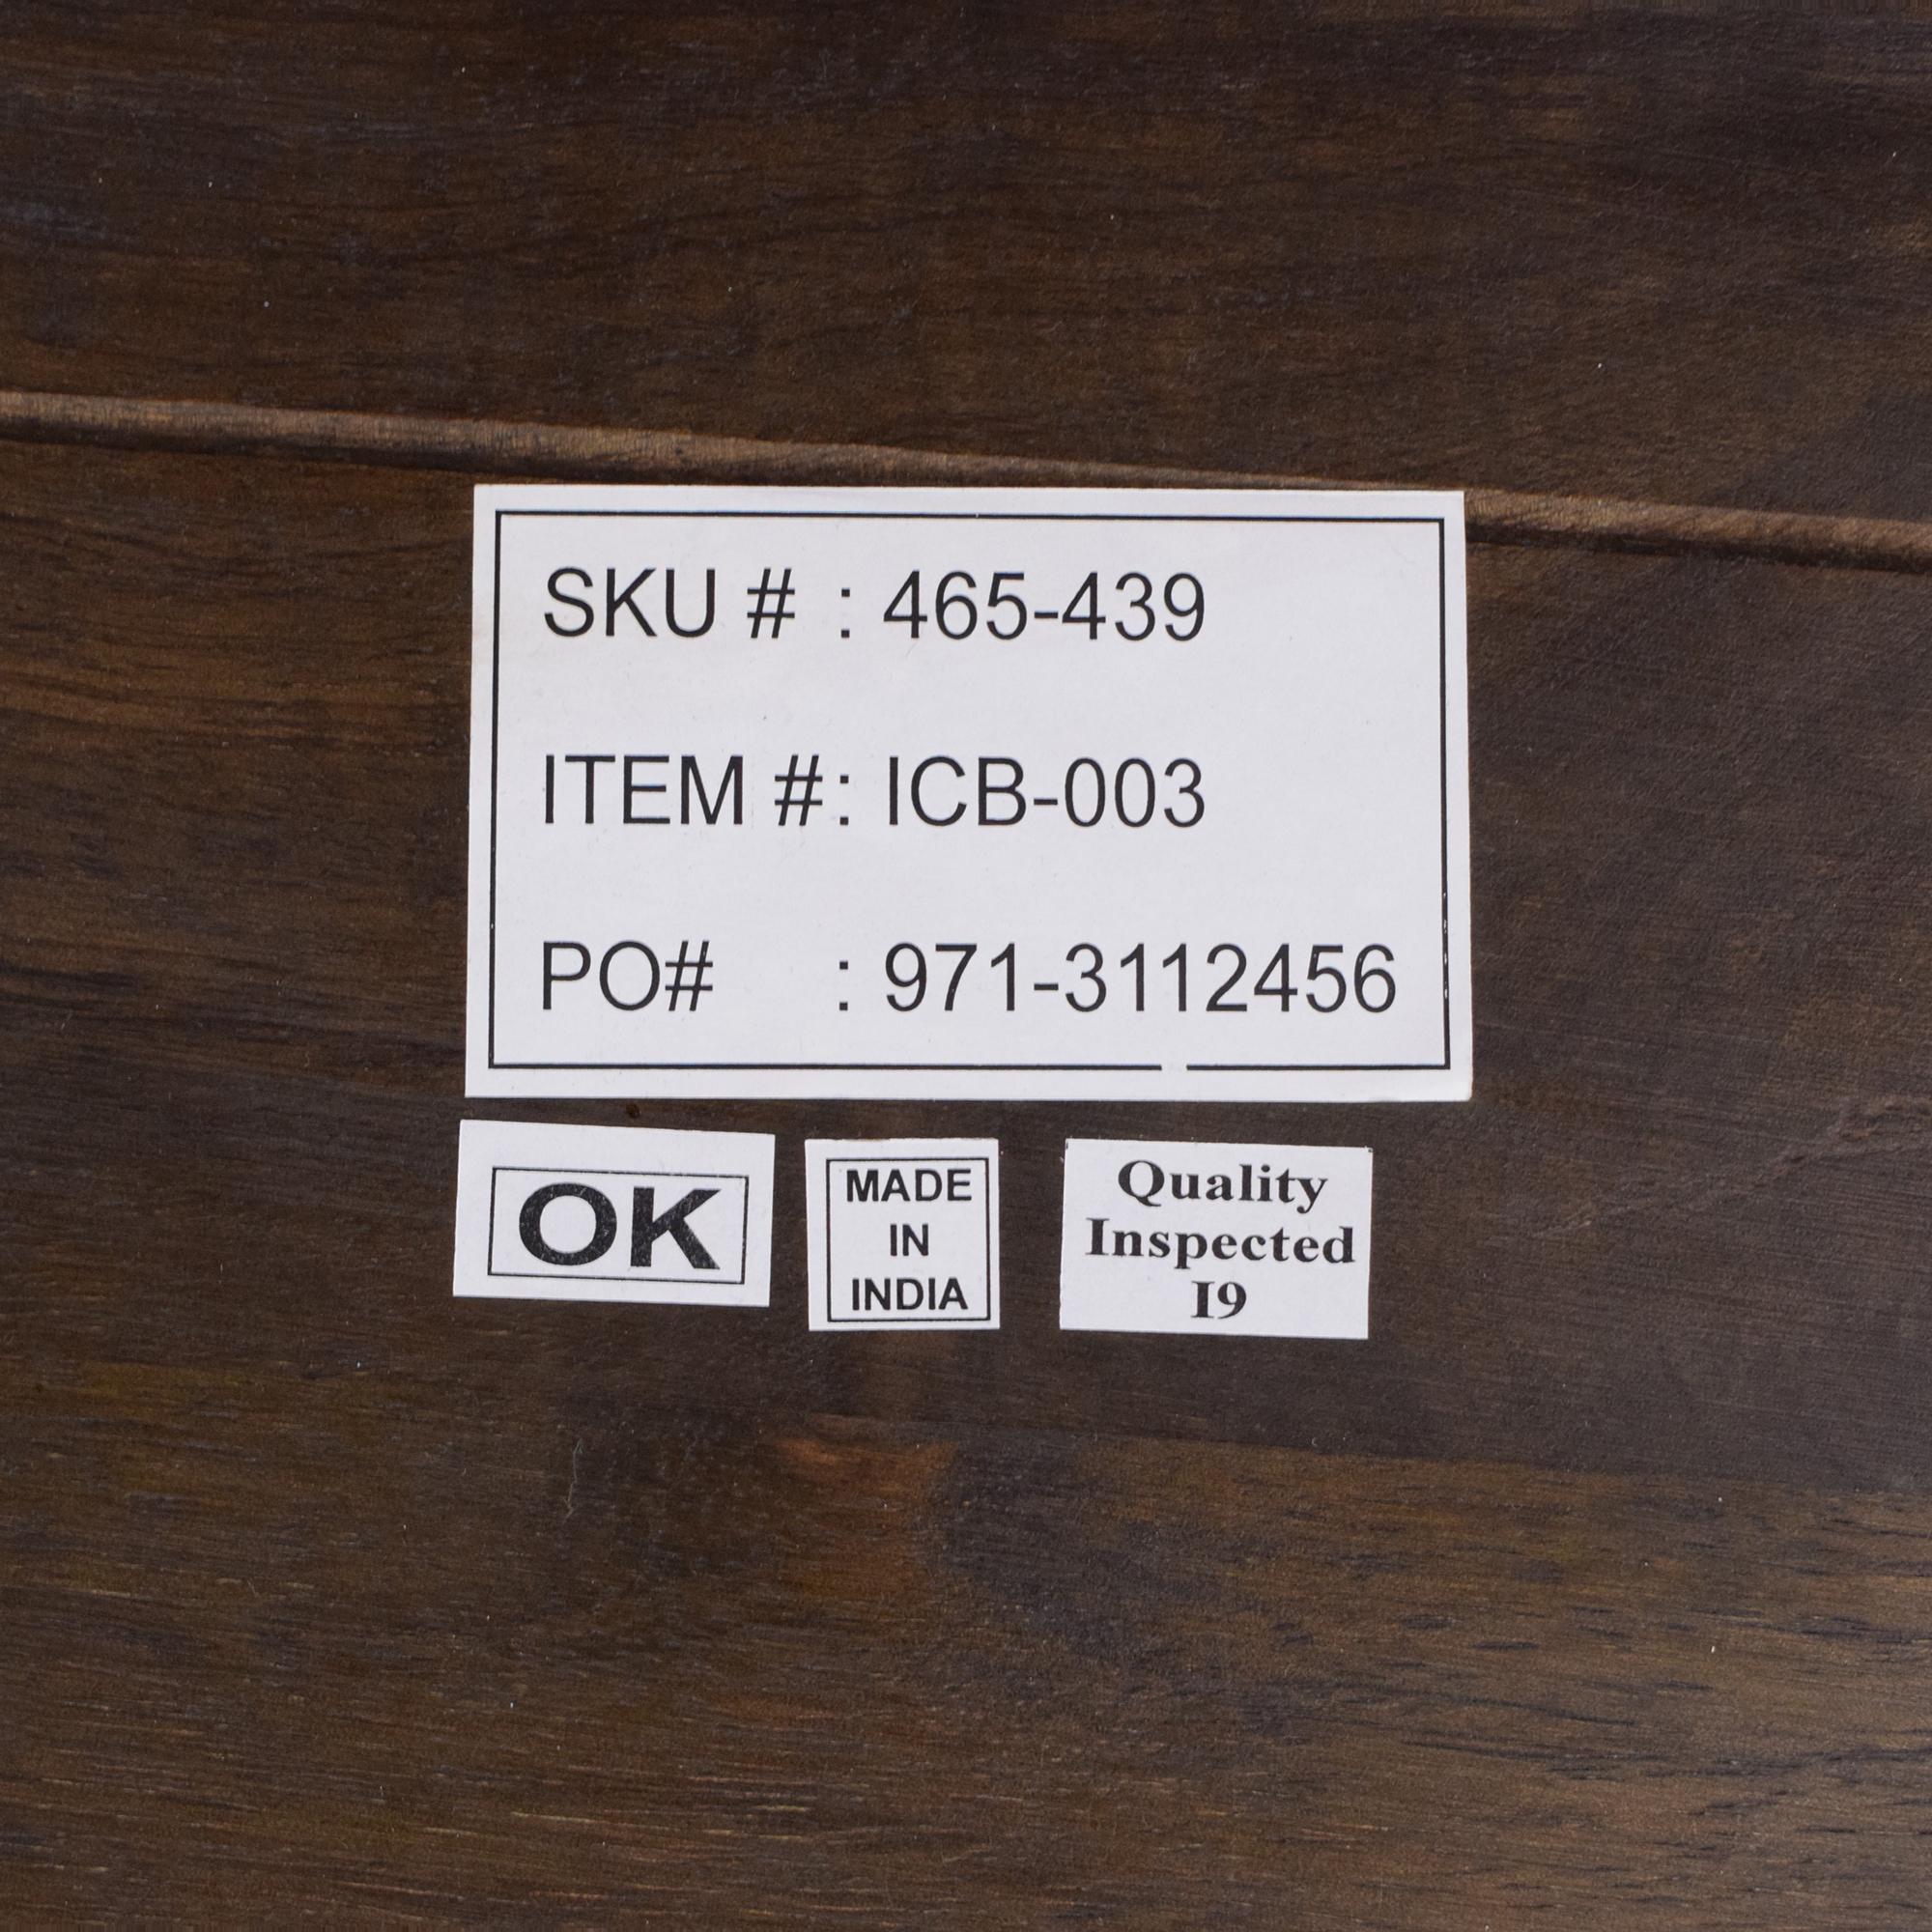 Crate & Barrel Crate & Barrel Pulman Bistro Table used